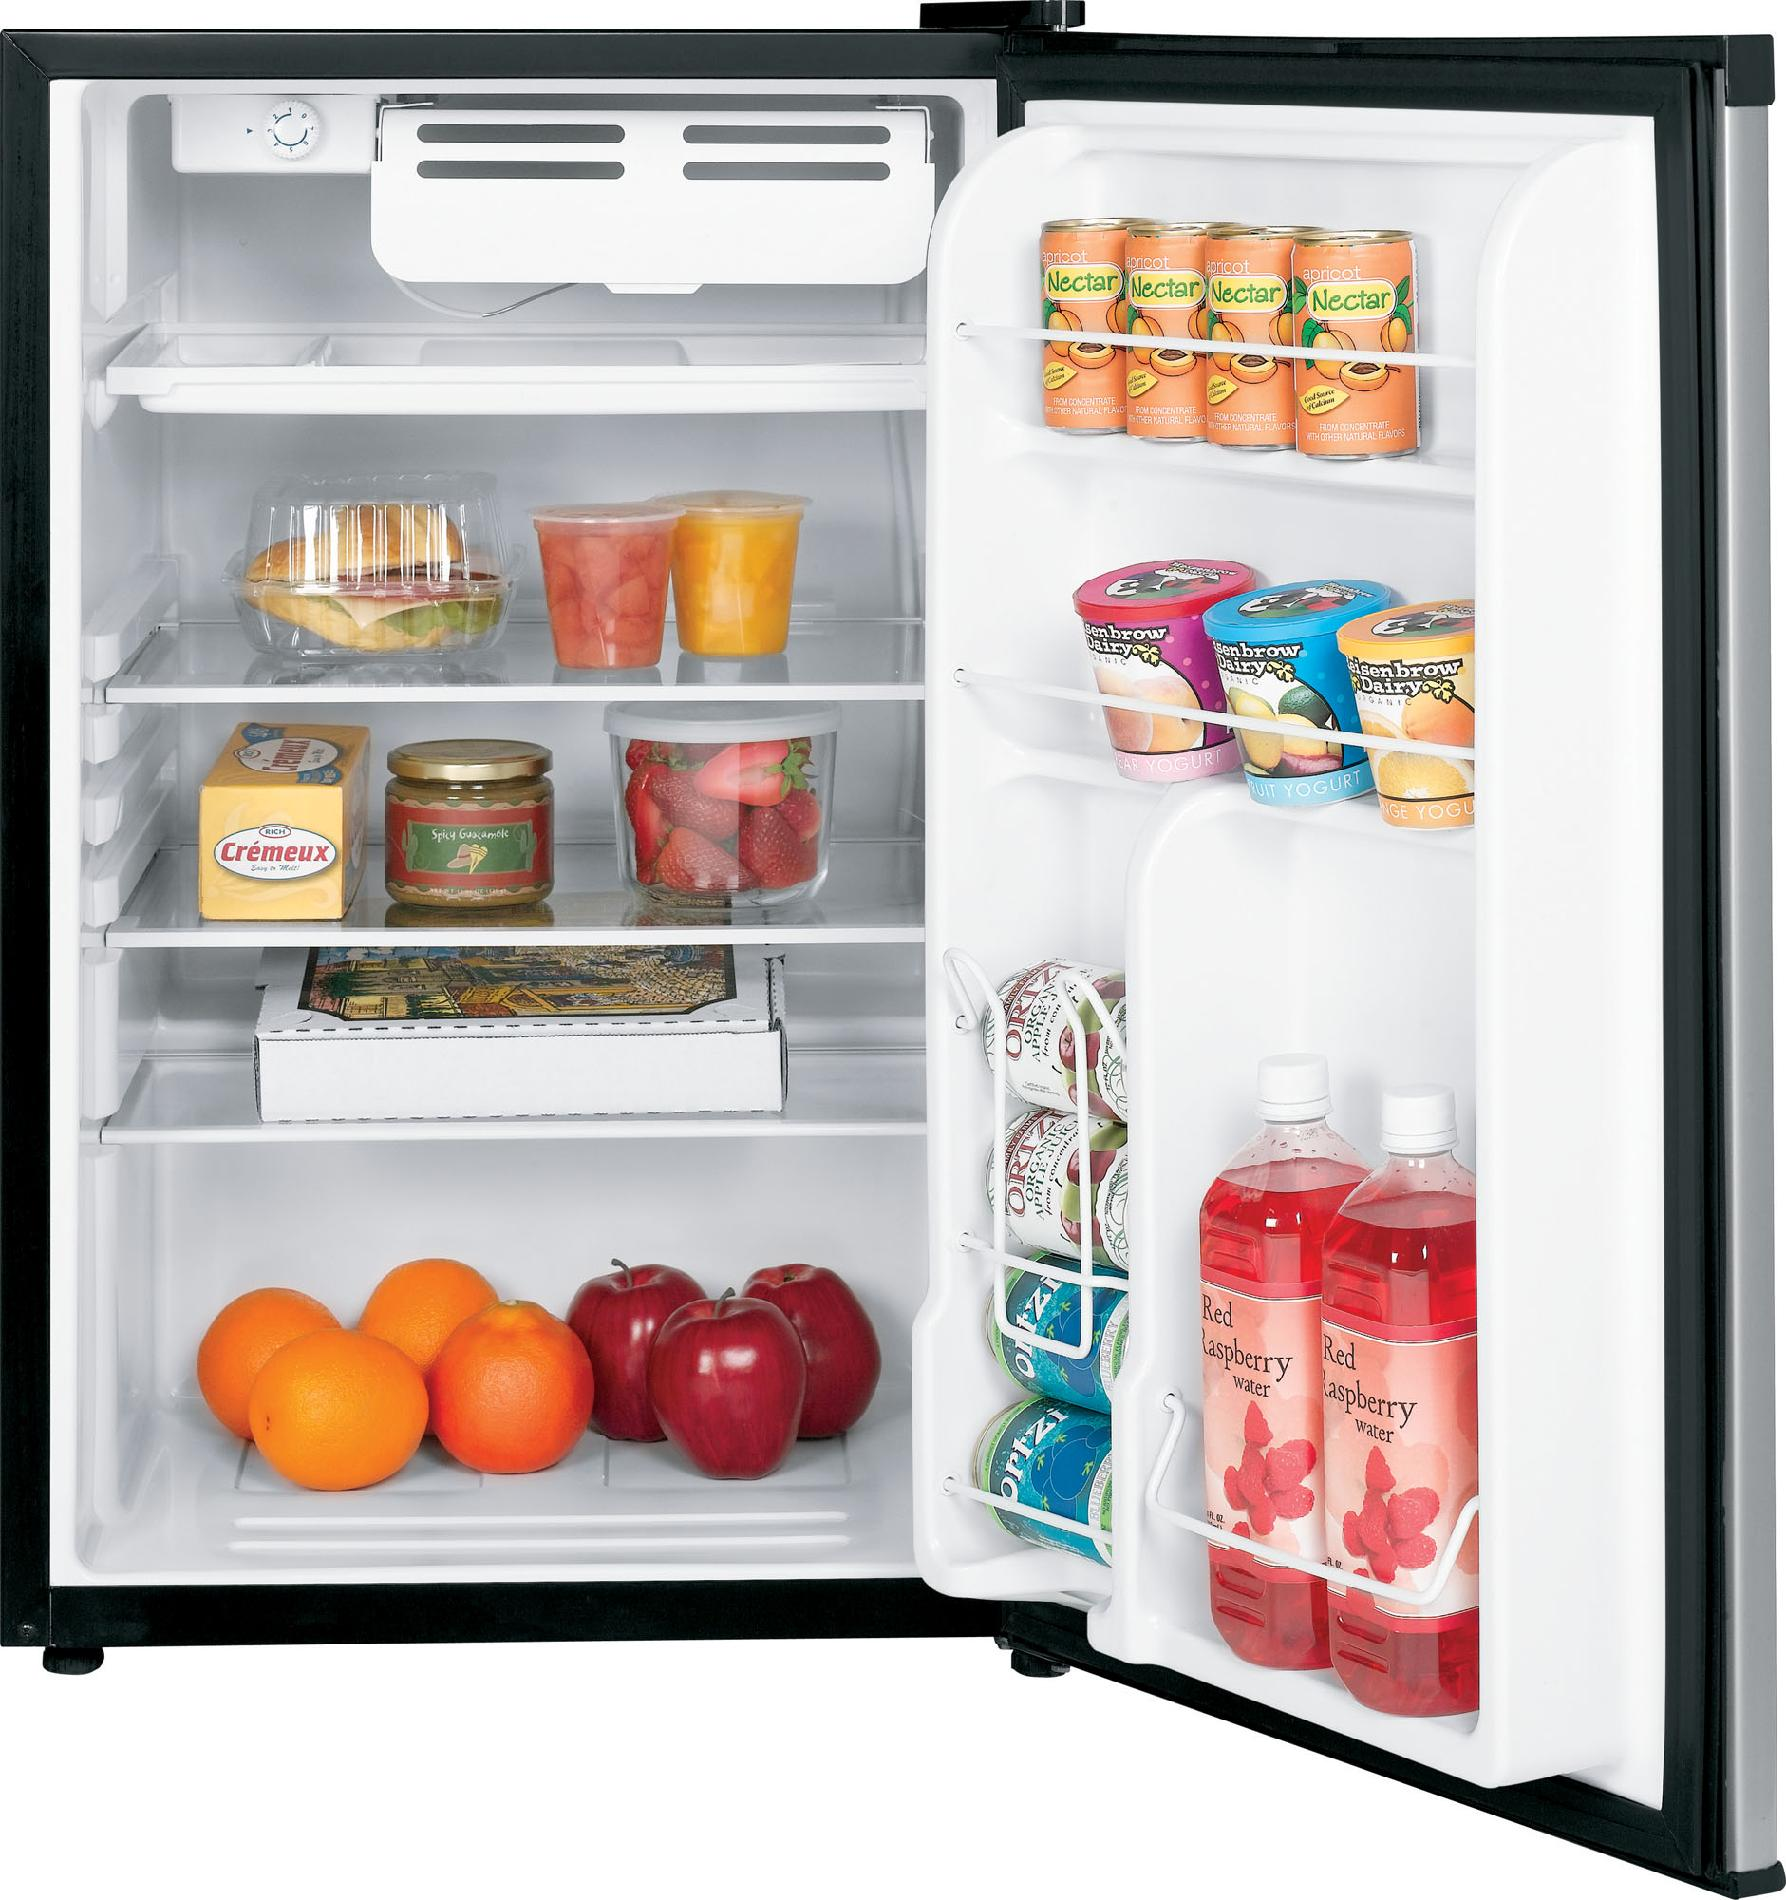 GE 4.4 cu. ft. Compact Refrigerator - Metallic